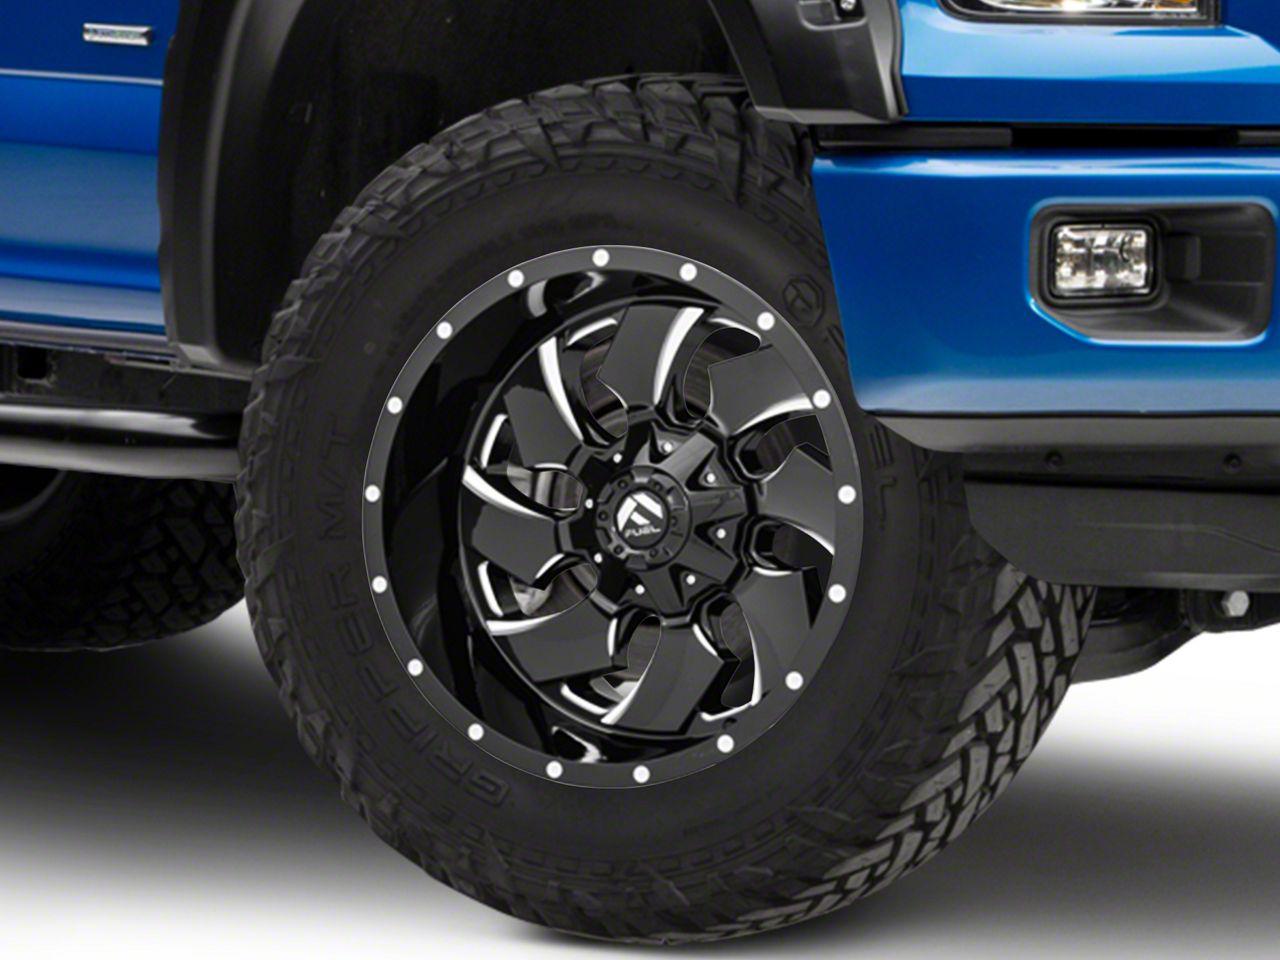 Fuel Wheels Cleaver Gloss Black Milled 6-Lug Wheel - 20x10 (04-19 F-150)